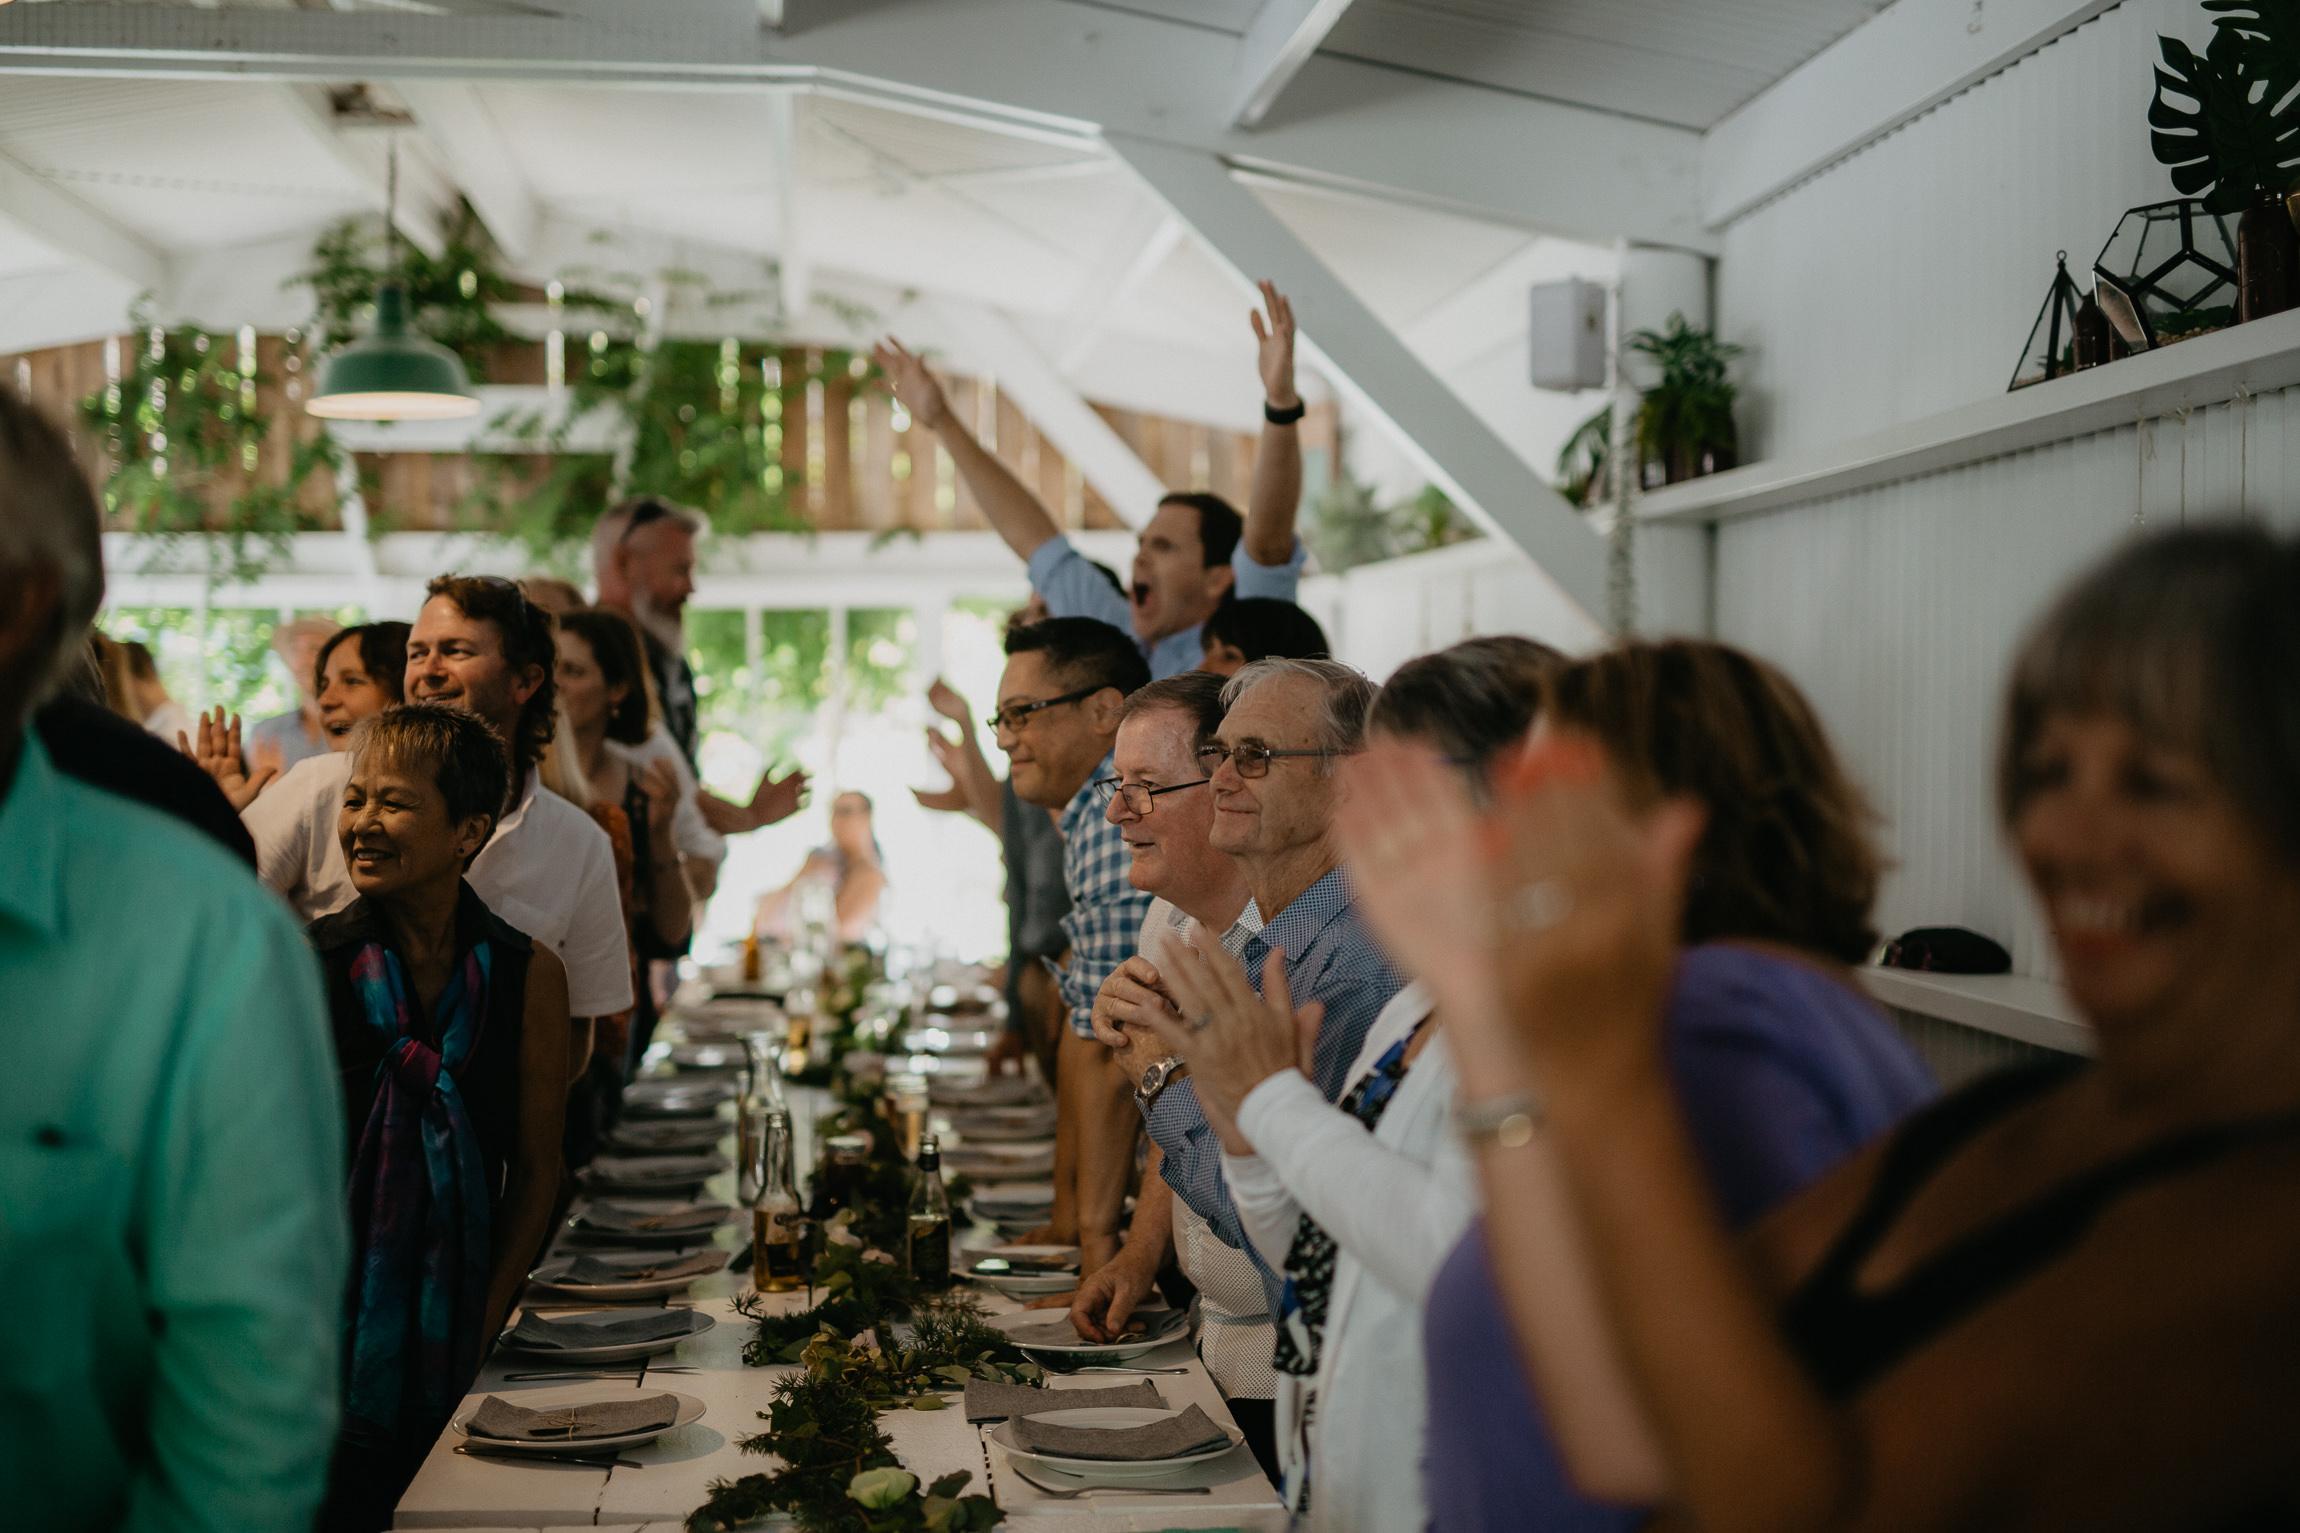 oldforestschool-wedding-blog-146.jpg